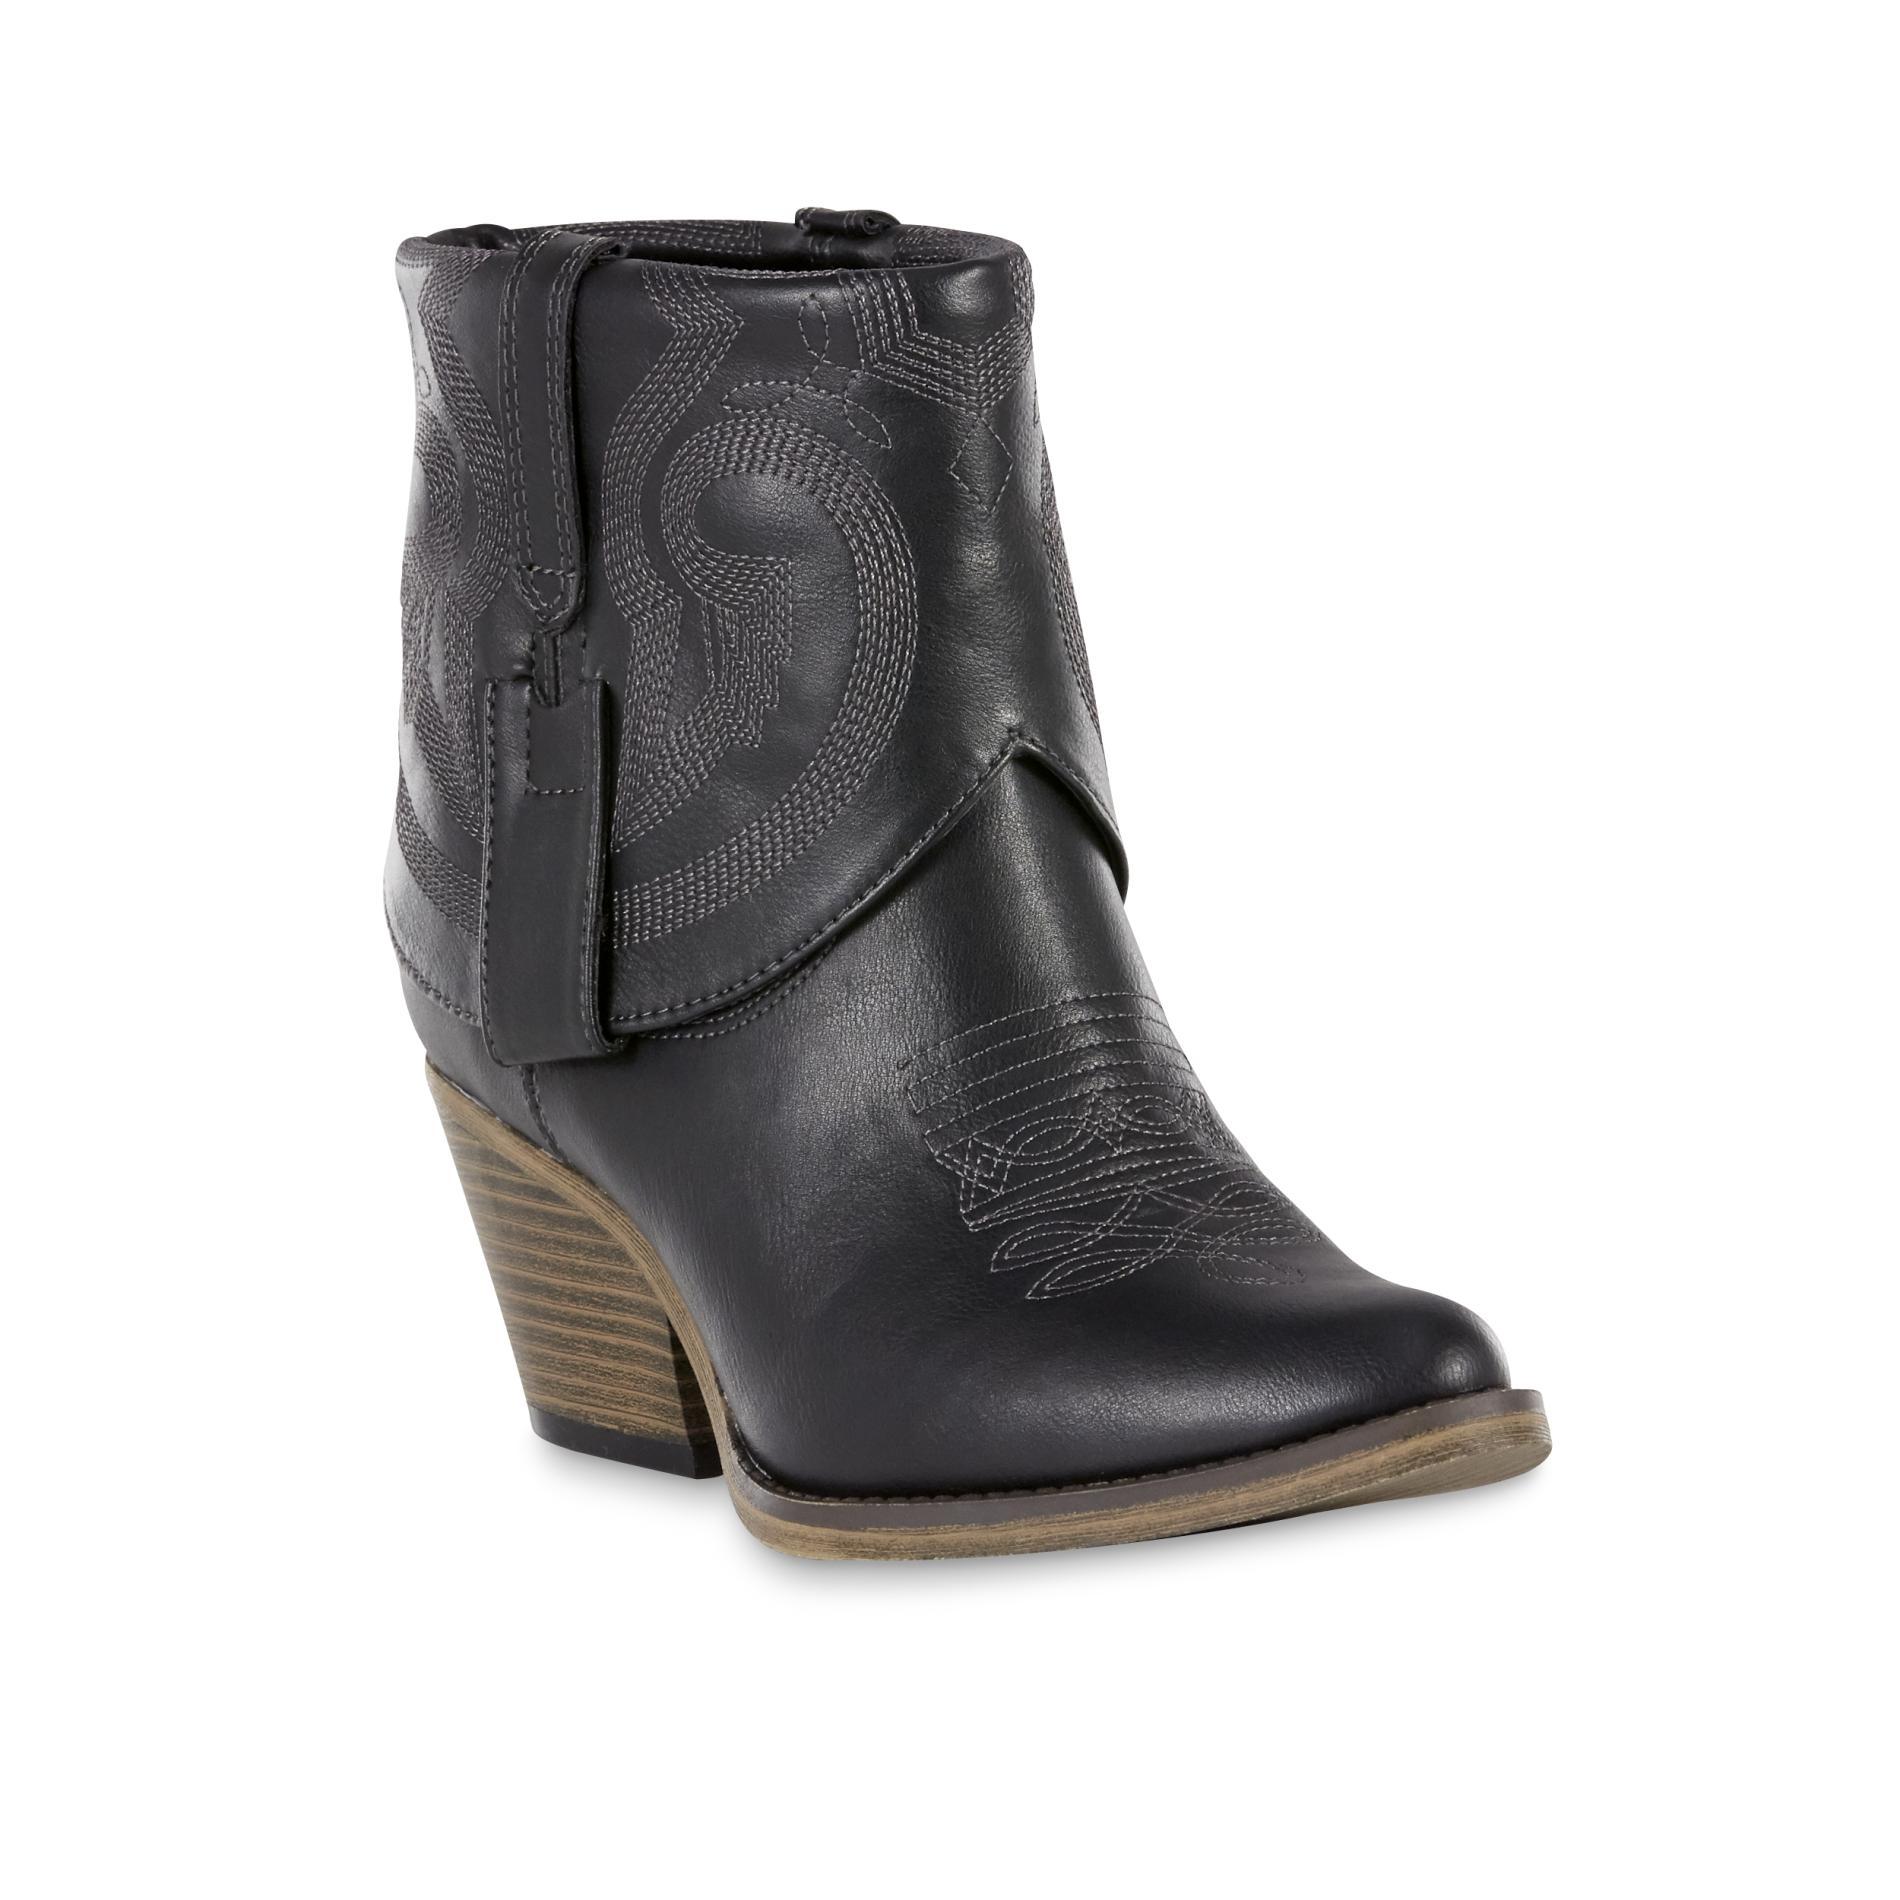 Sears Bongo Boots for Women